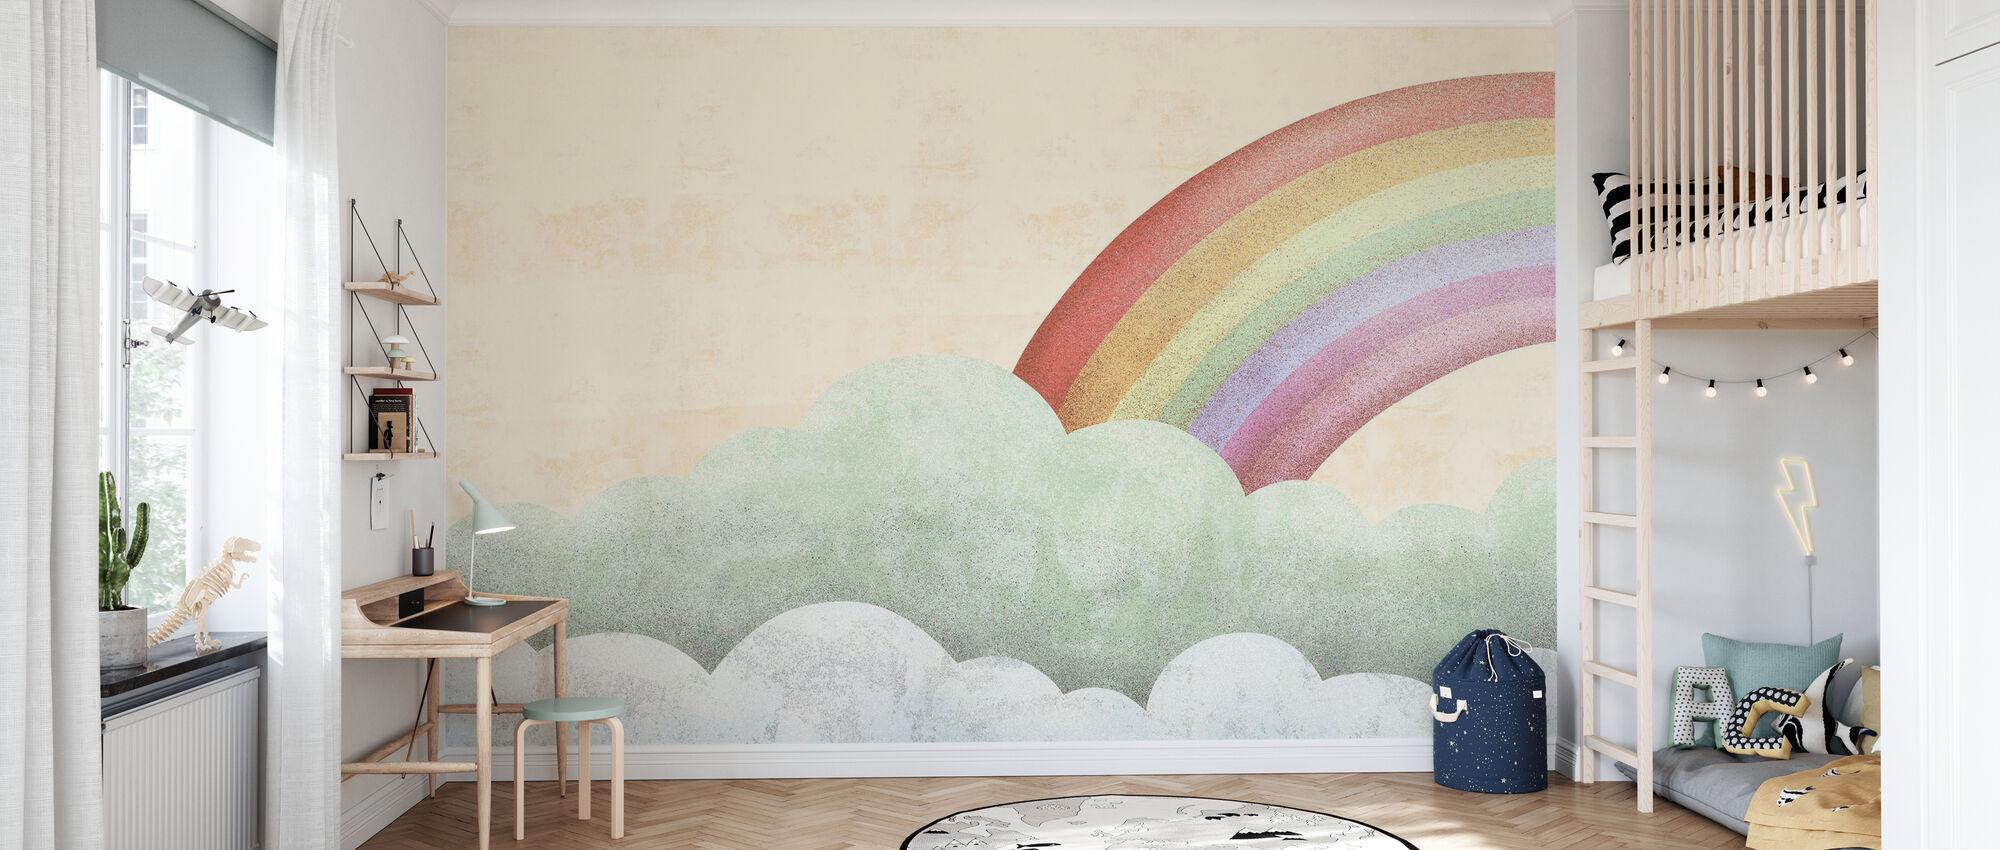 rainbow - Wallpaper - Kids Room